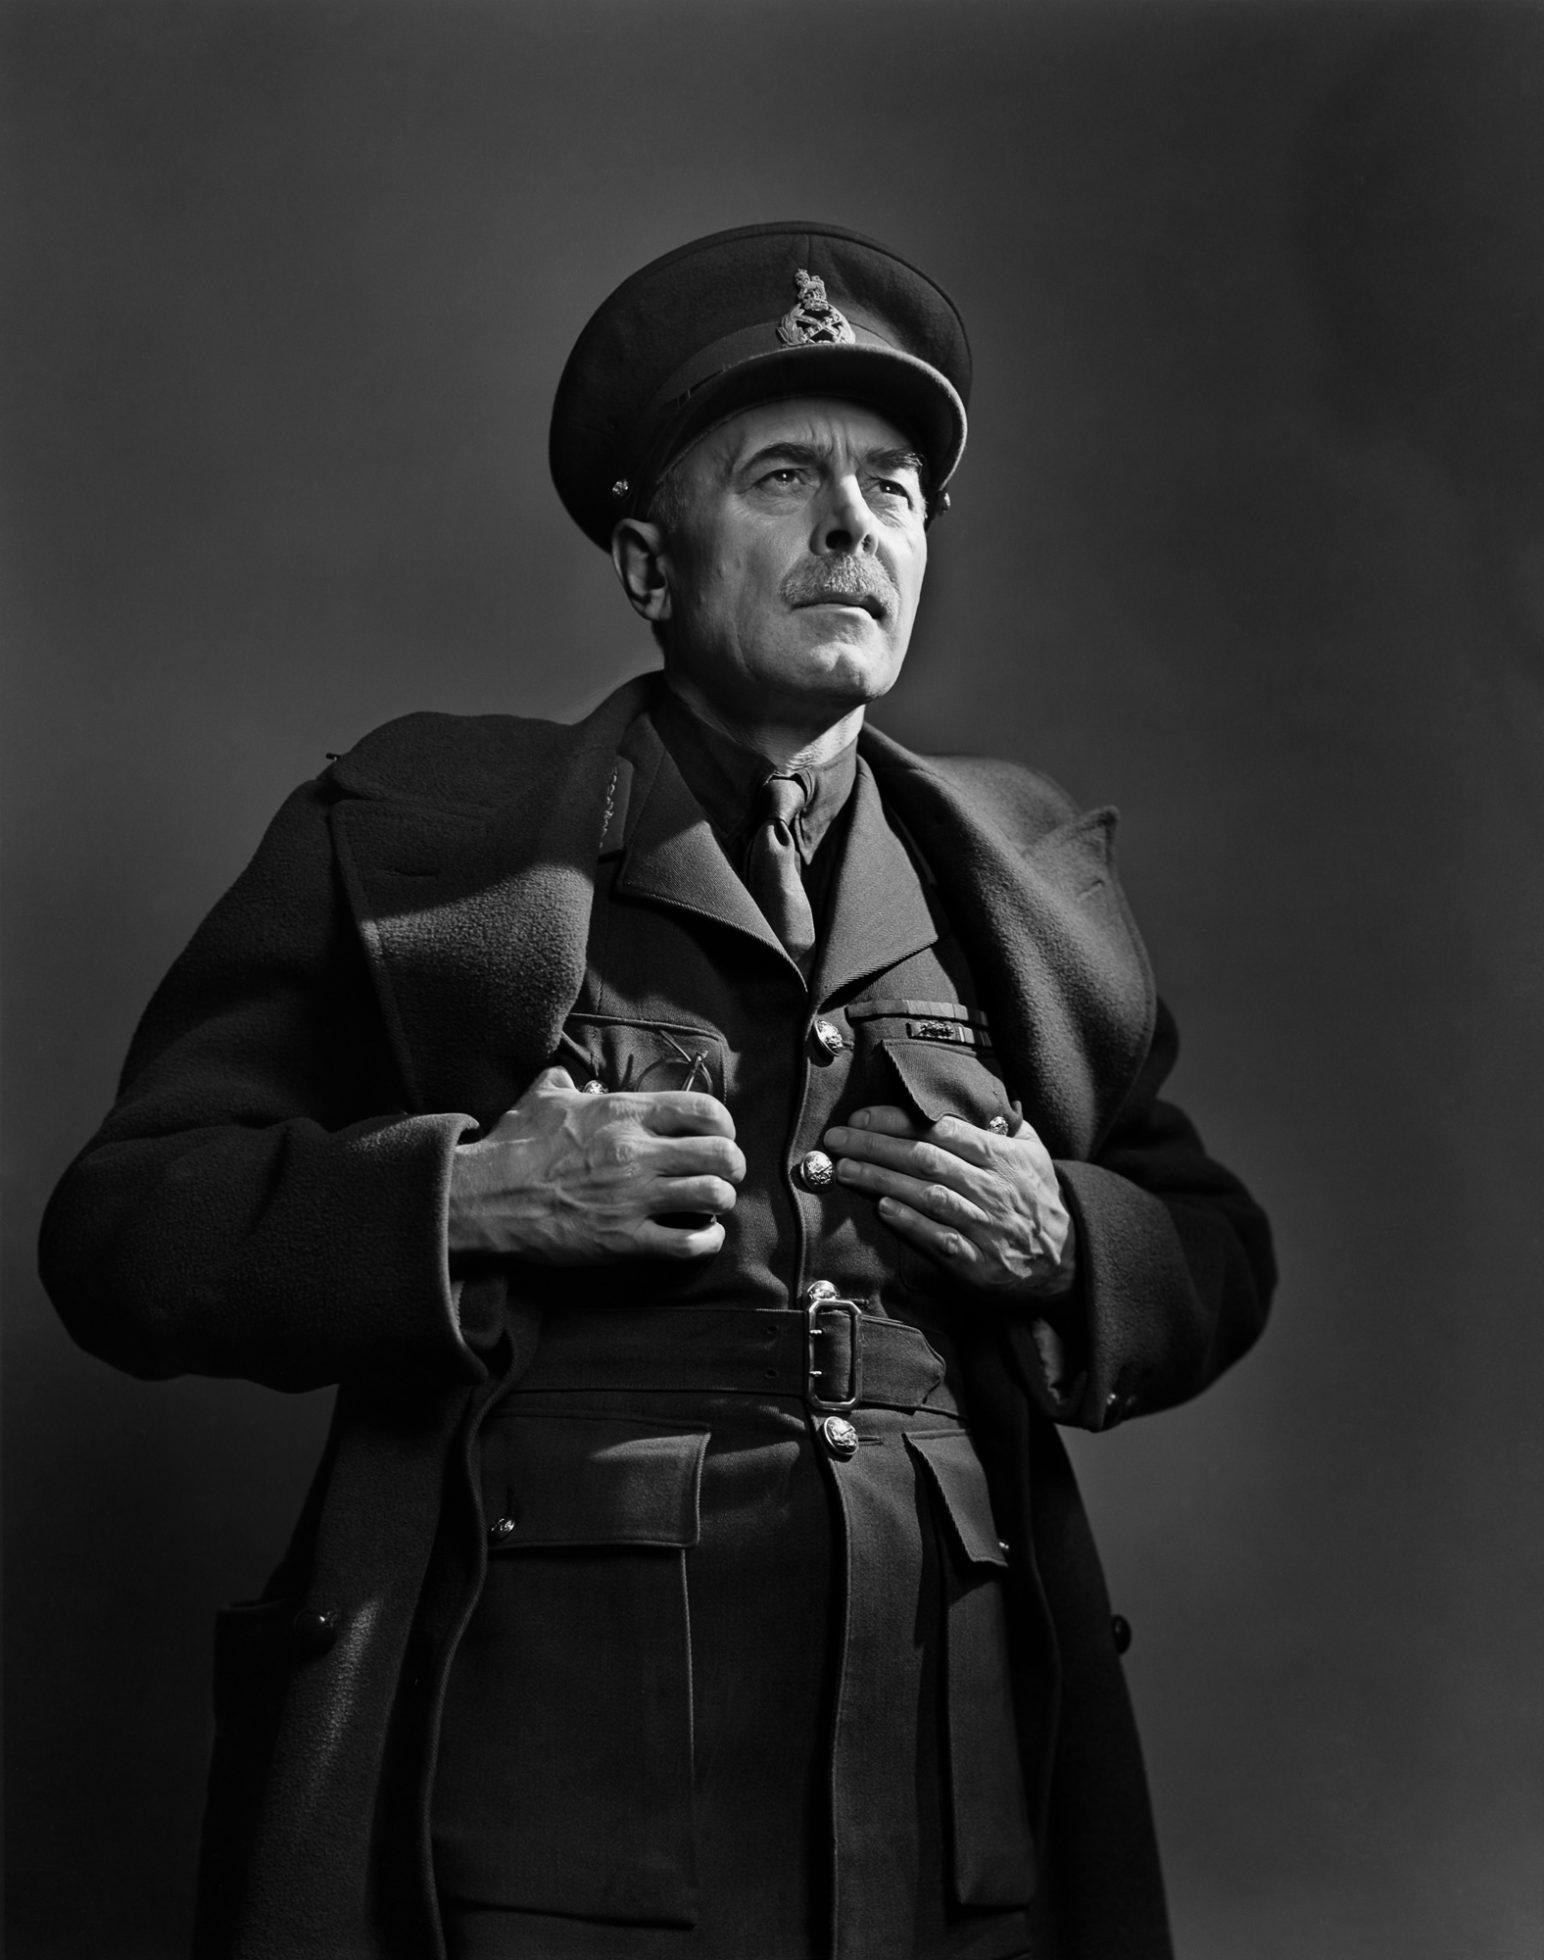 General Andrew McNaughton